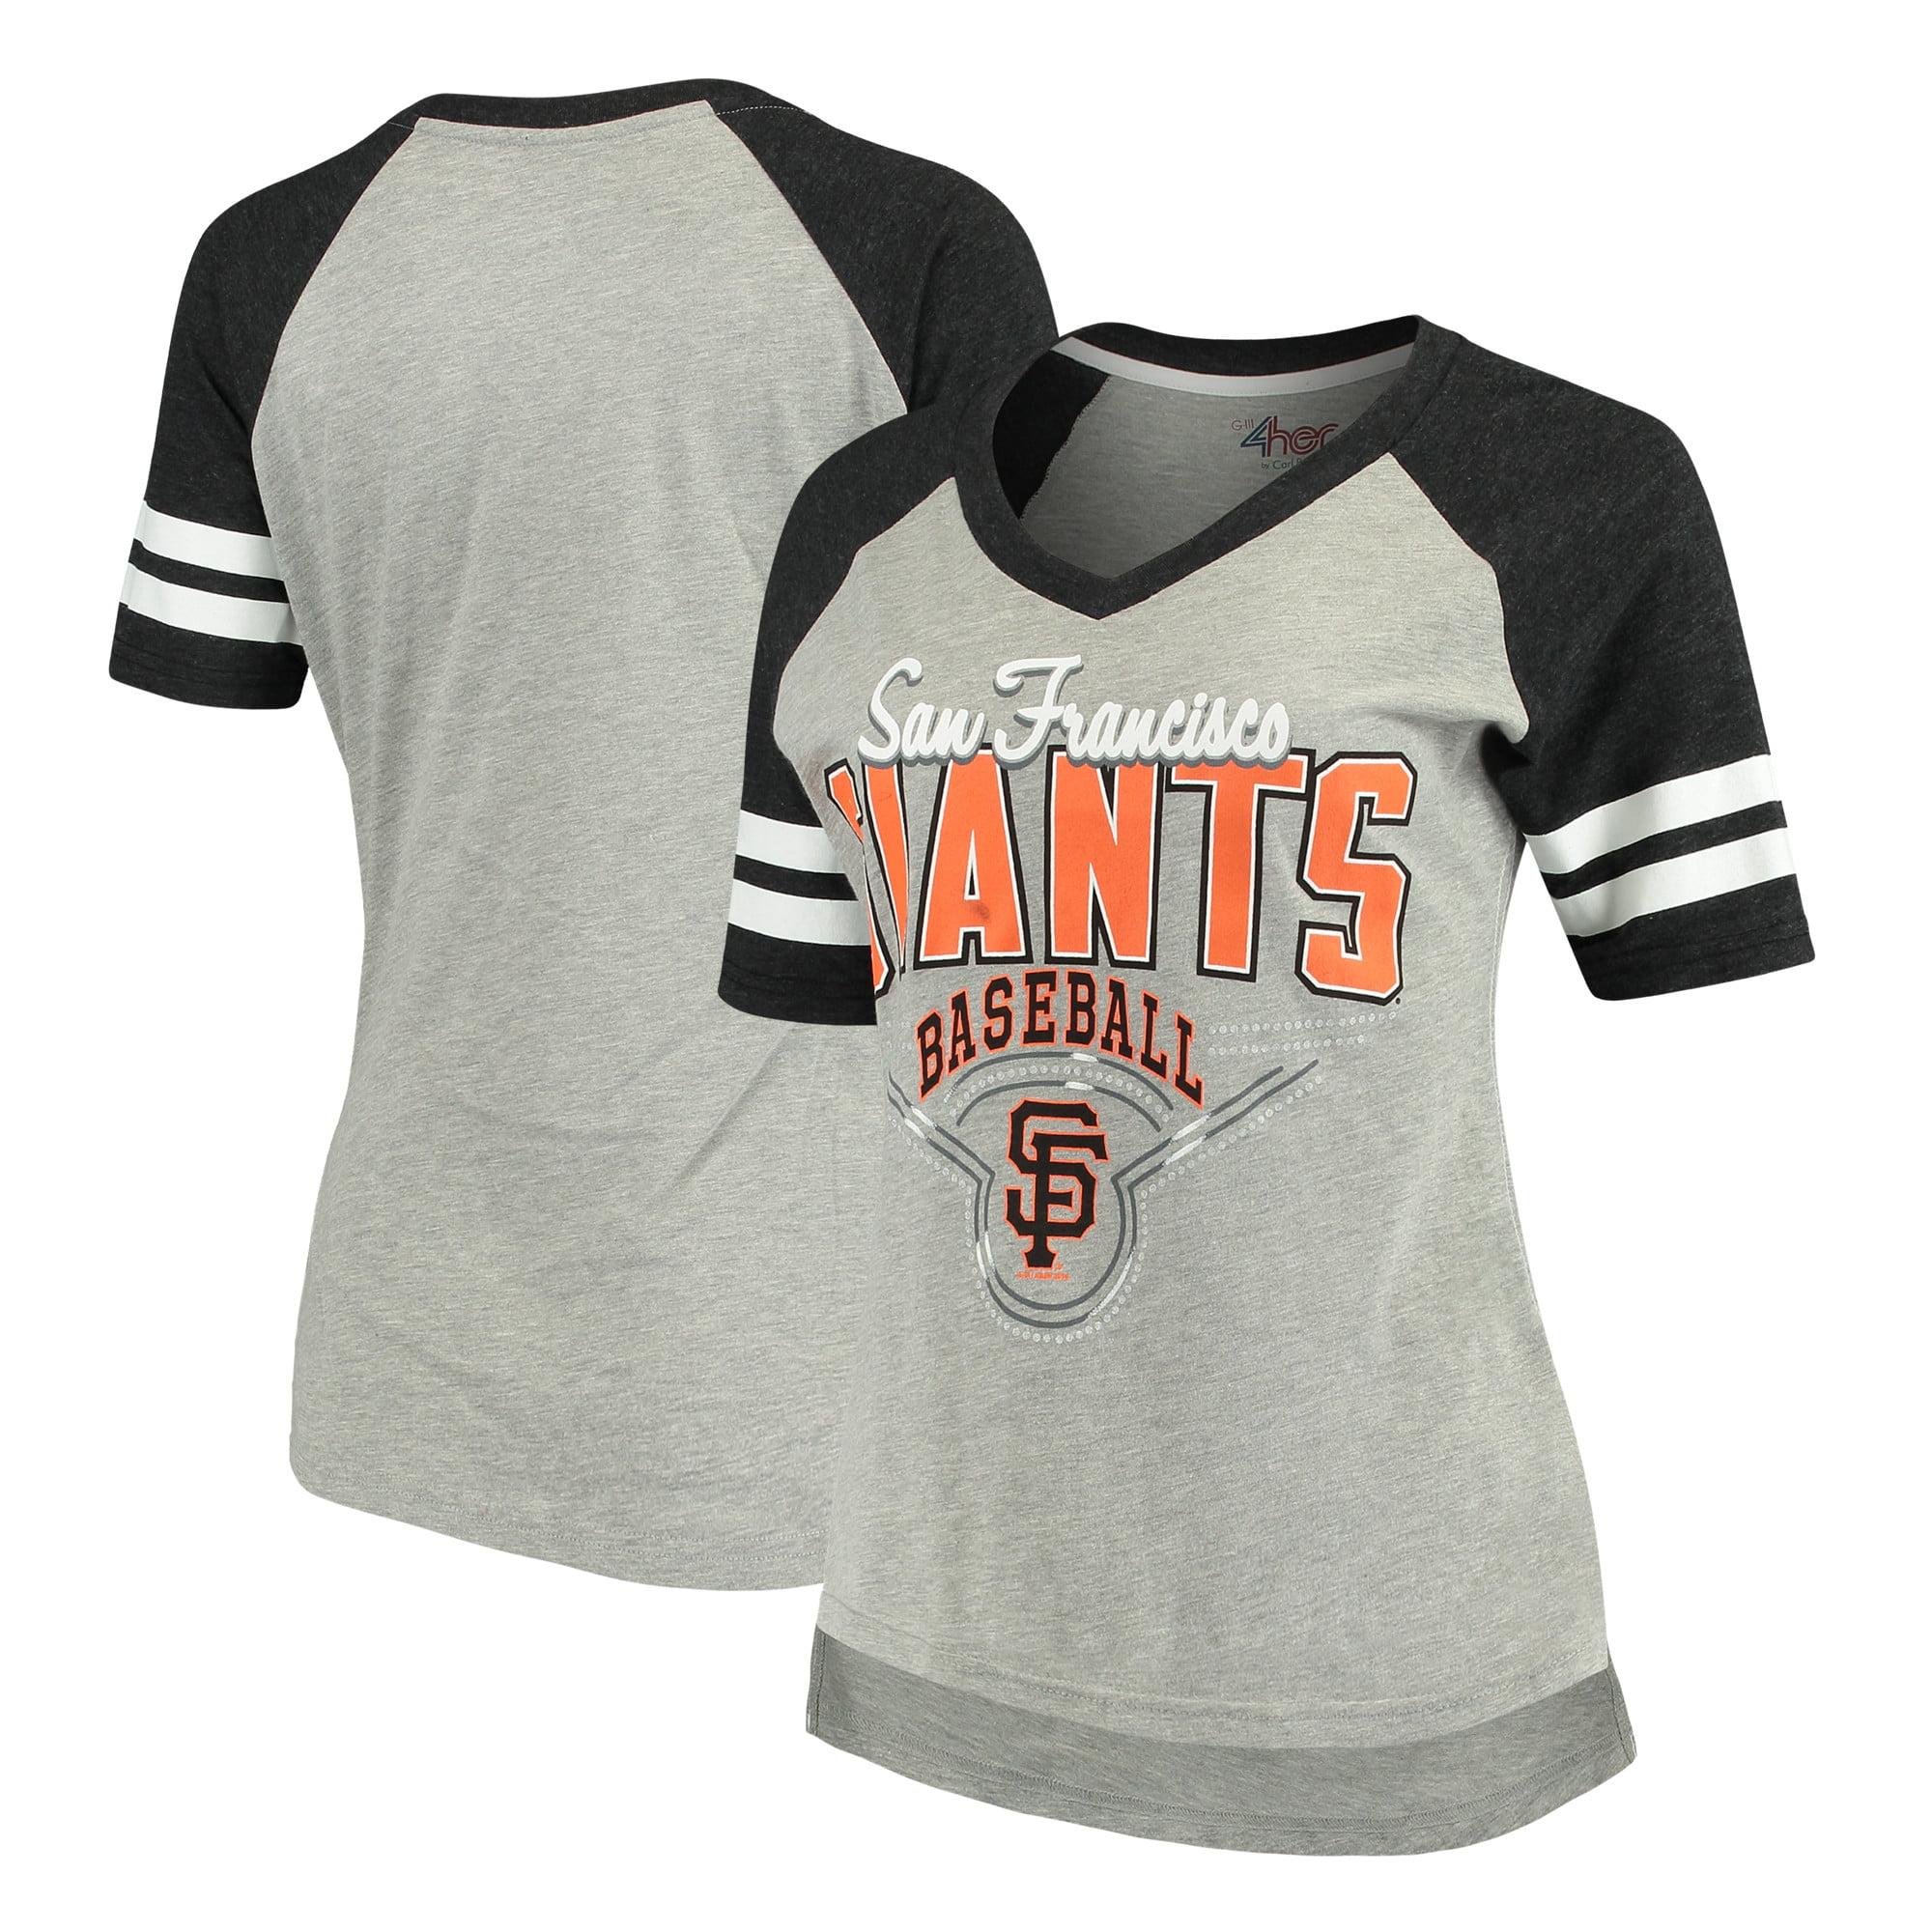 San Francisco Giants G-III 4Her by Carl Banks Women's Goal Line T-Shirt - Heathered Gray/Black